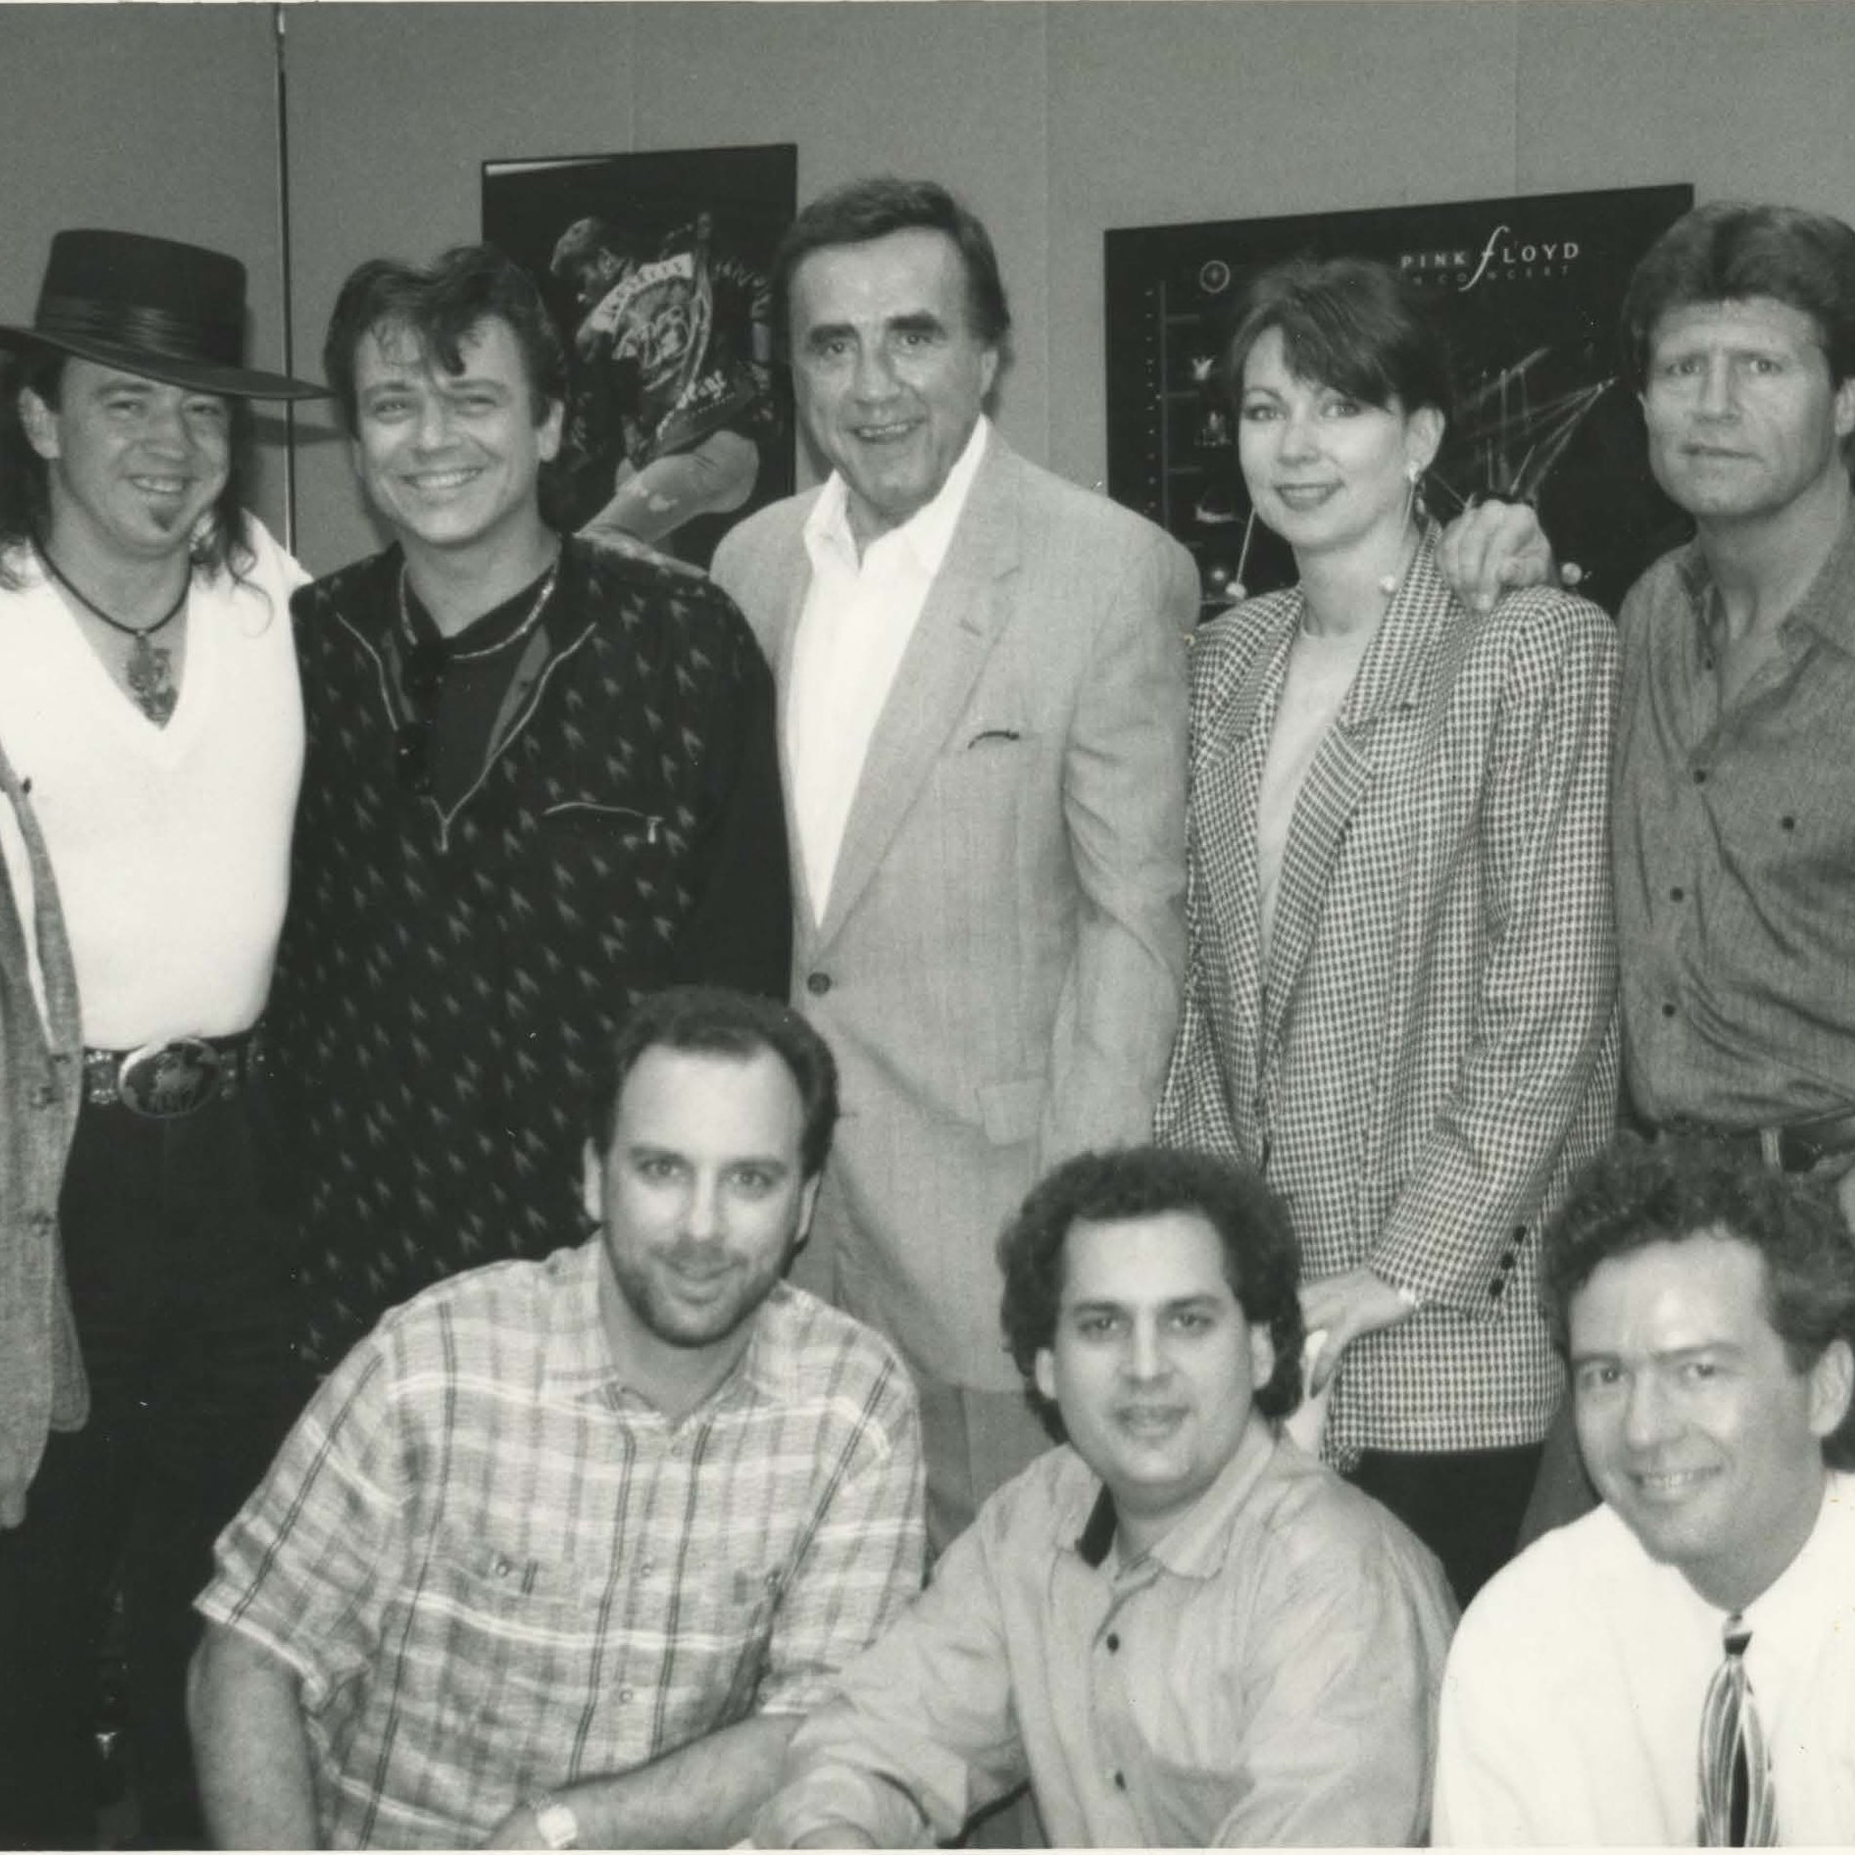 Stevie Ray & Jimmie Vaughn